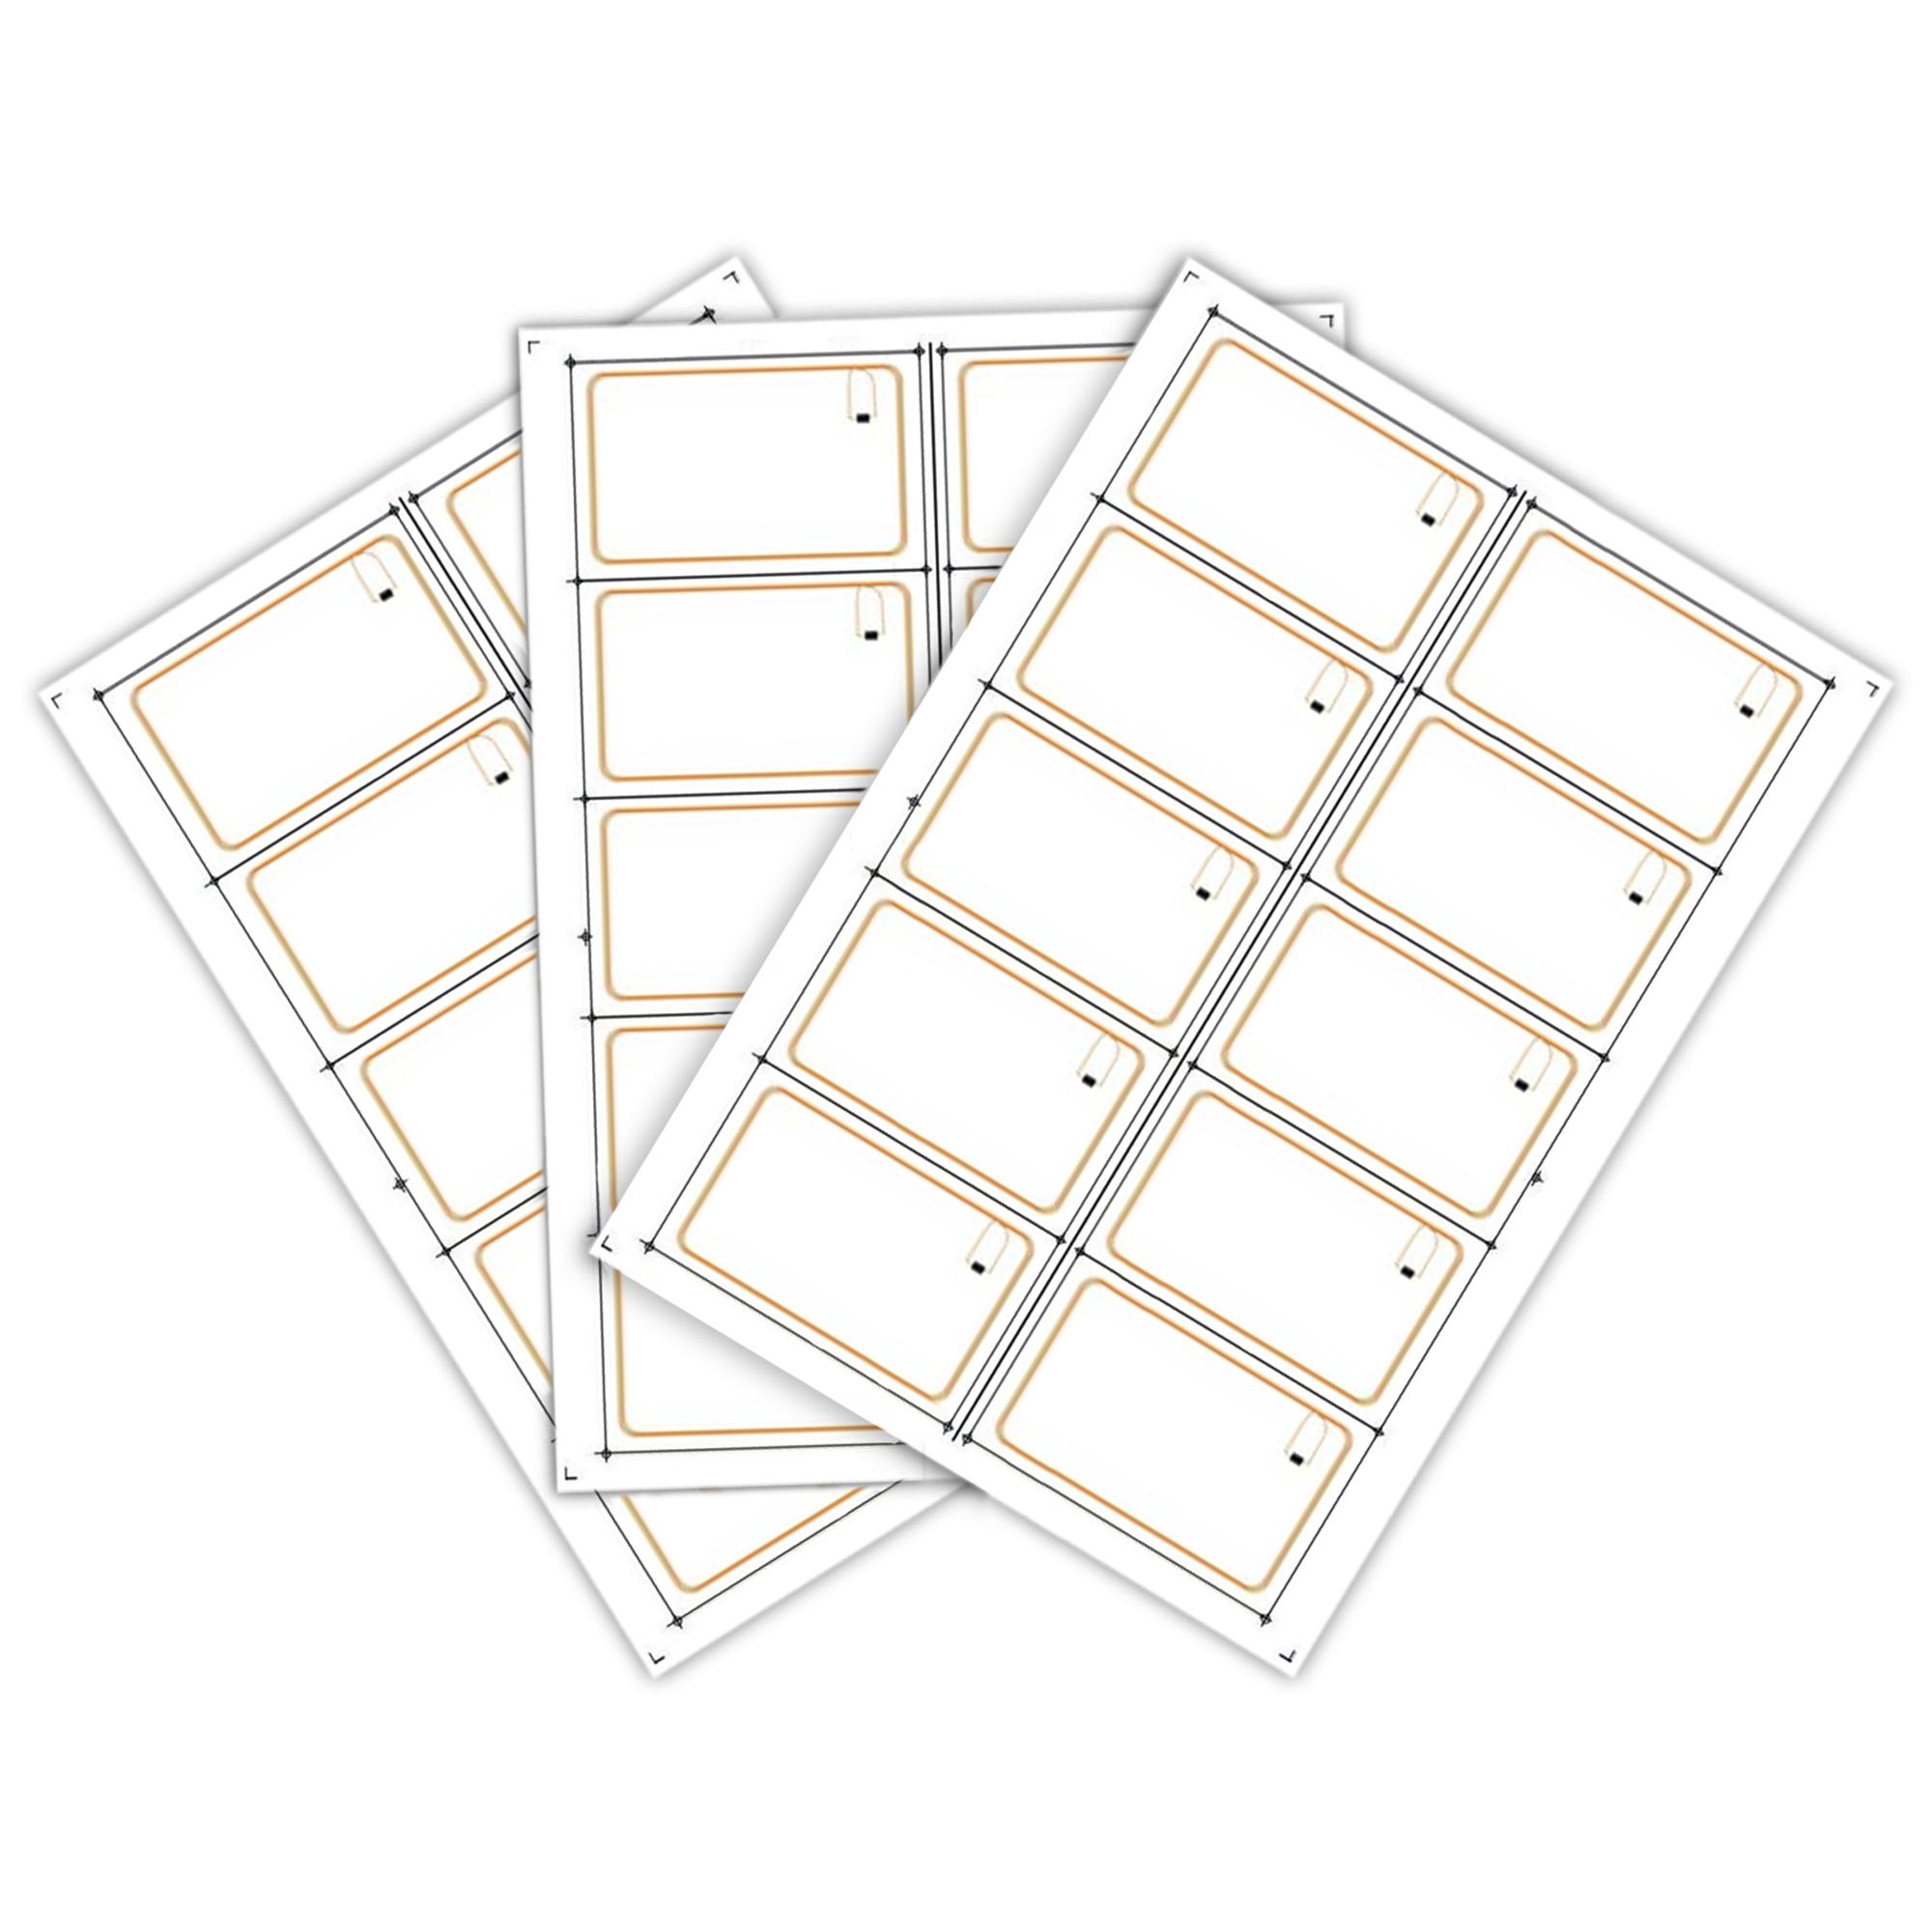 Сырье (инлей) для производства RFID-карт Mifare 1K (10 чипов на листе формата A4) (UID 4 байт)